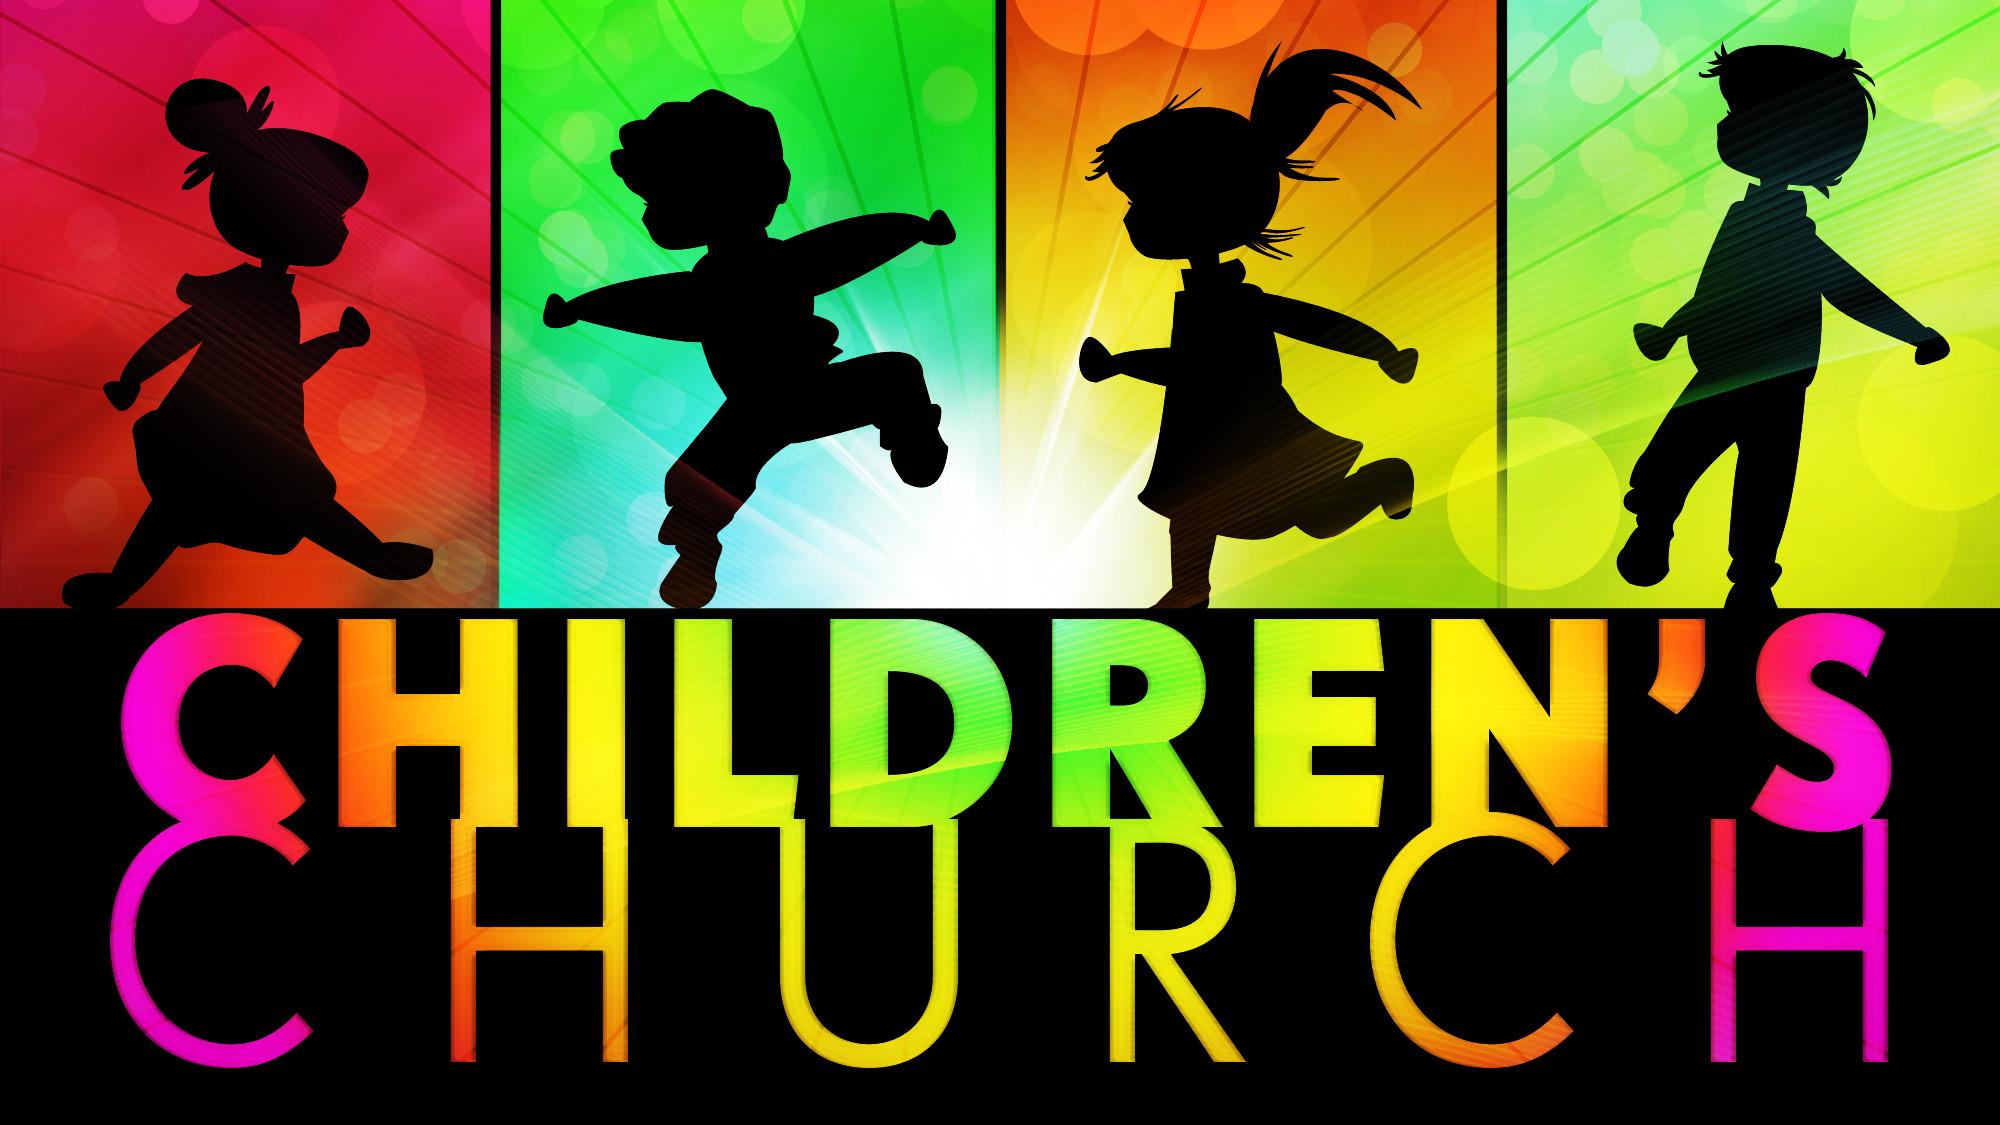 Children's Church_wide_t_nv.jpg